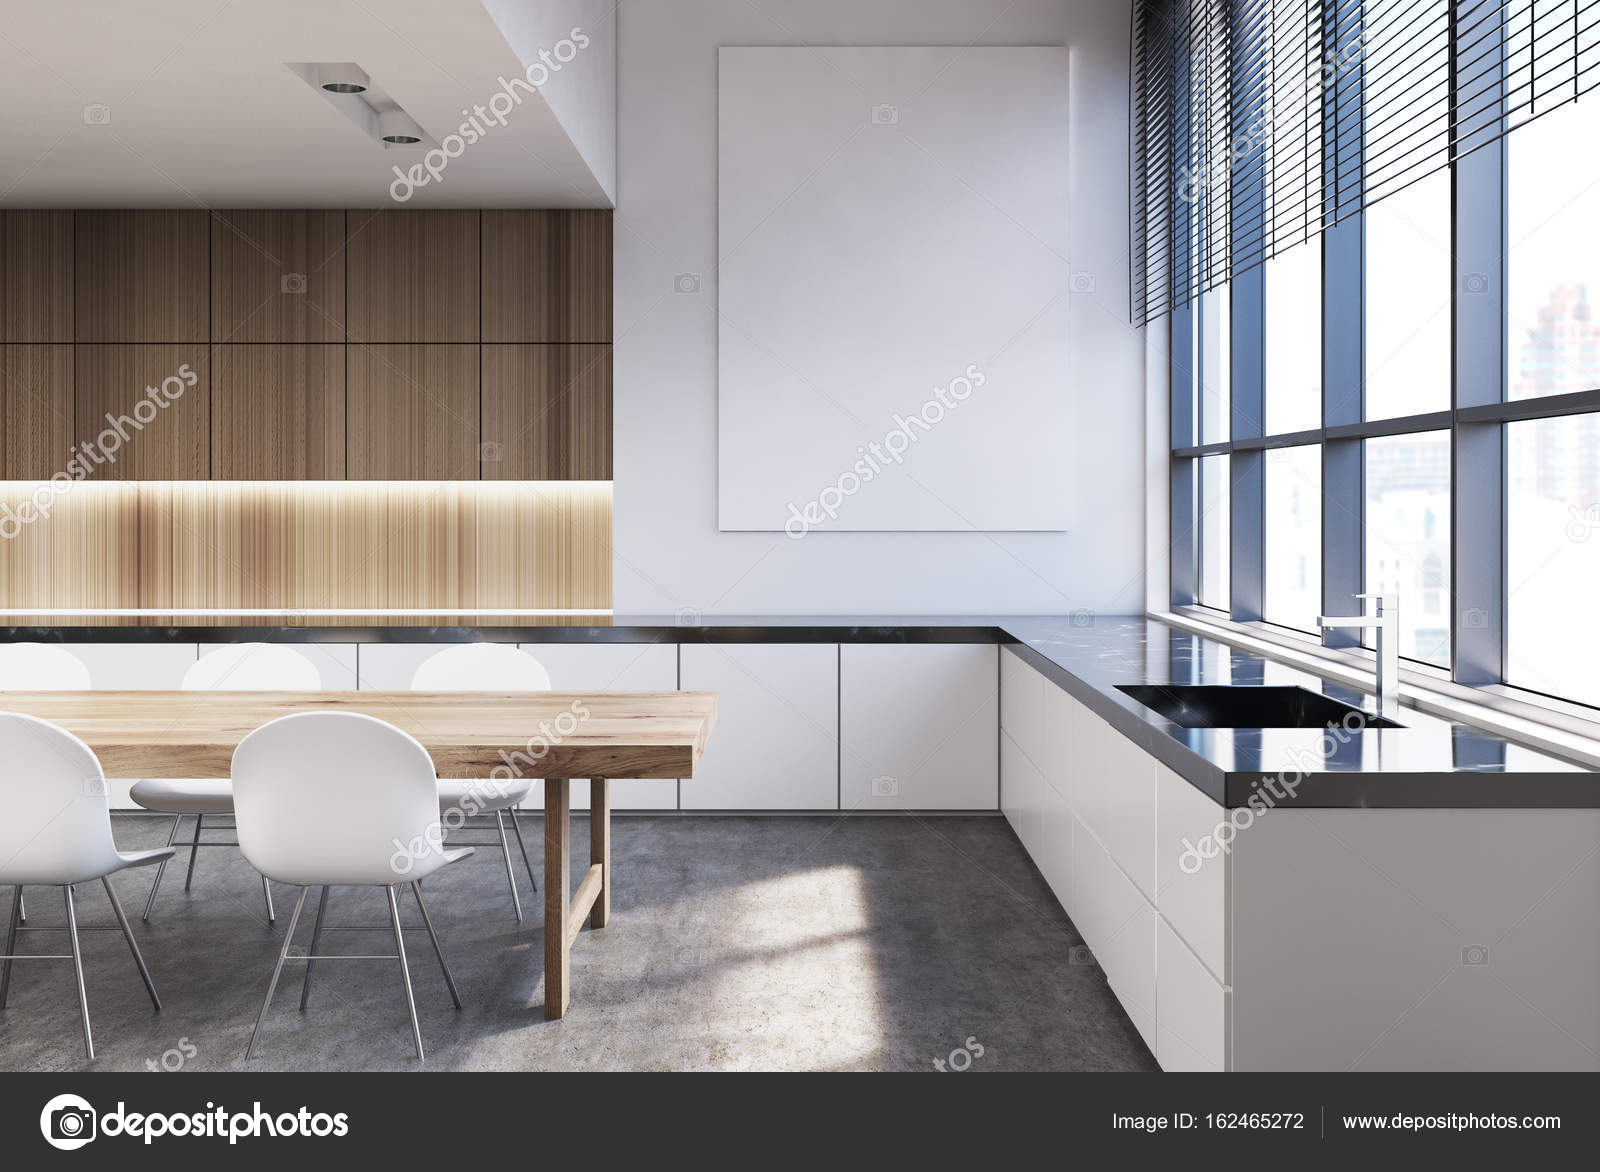 Küche aus Holz Interieur, dunklen Marmor — Stockfoto ...